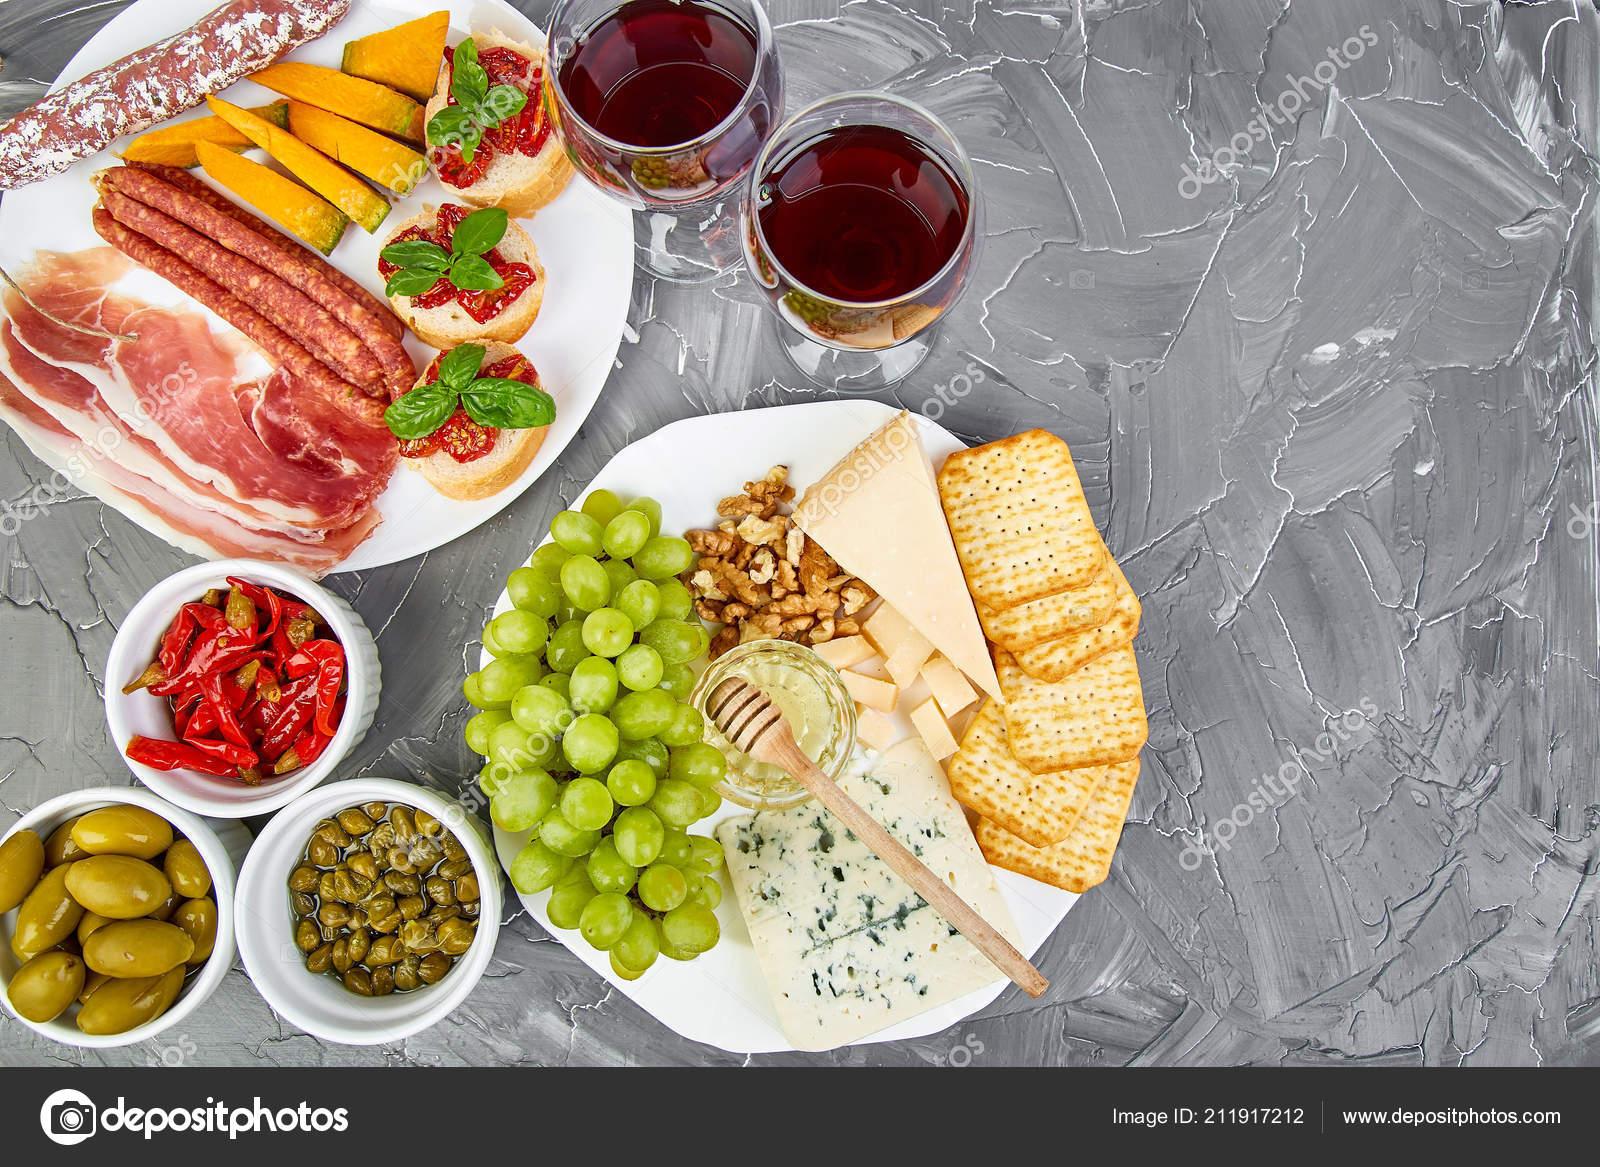 Italian Antipasti Wine Snacks Set Wine Glasses Antipasto Catering Platter Stock Photo Image By C Bondarillia 211917212